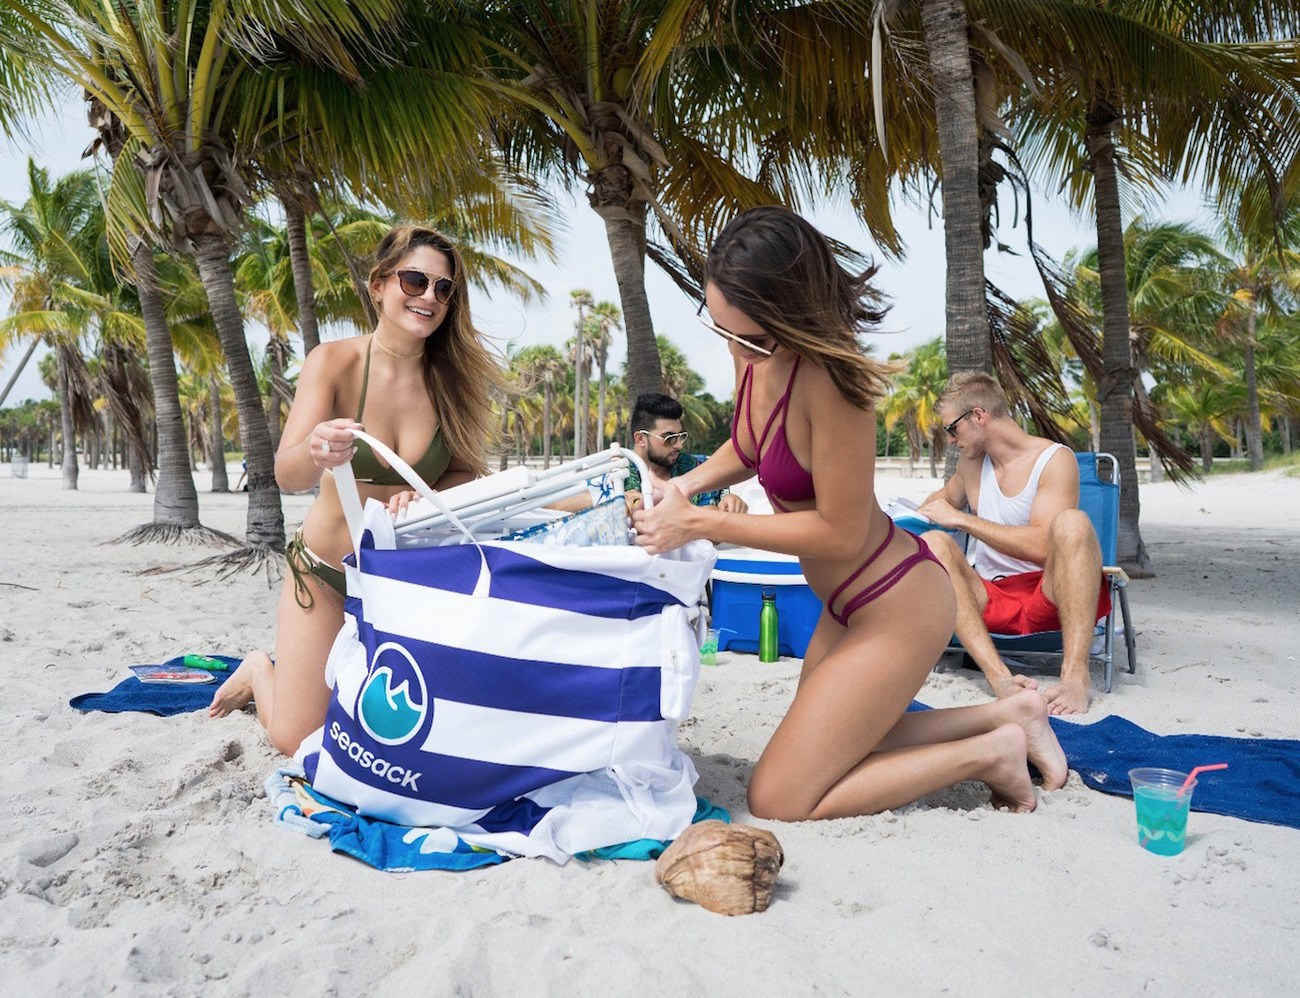 SeaSack – A Beach Chair Backpack